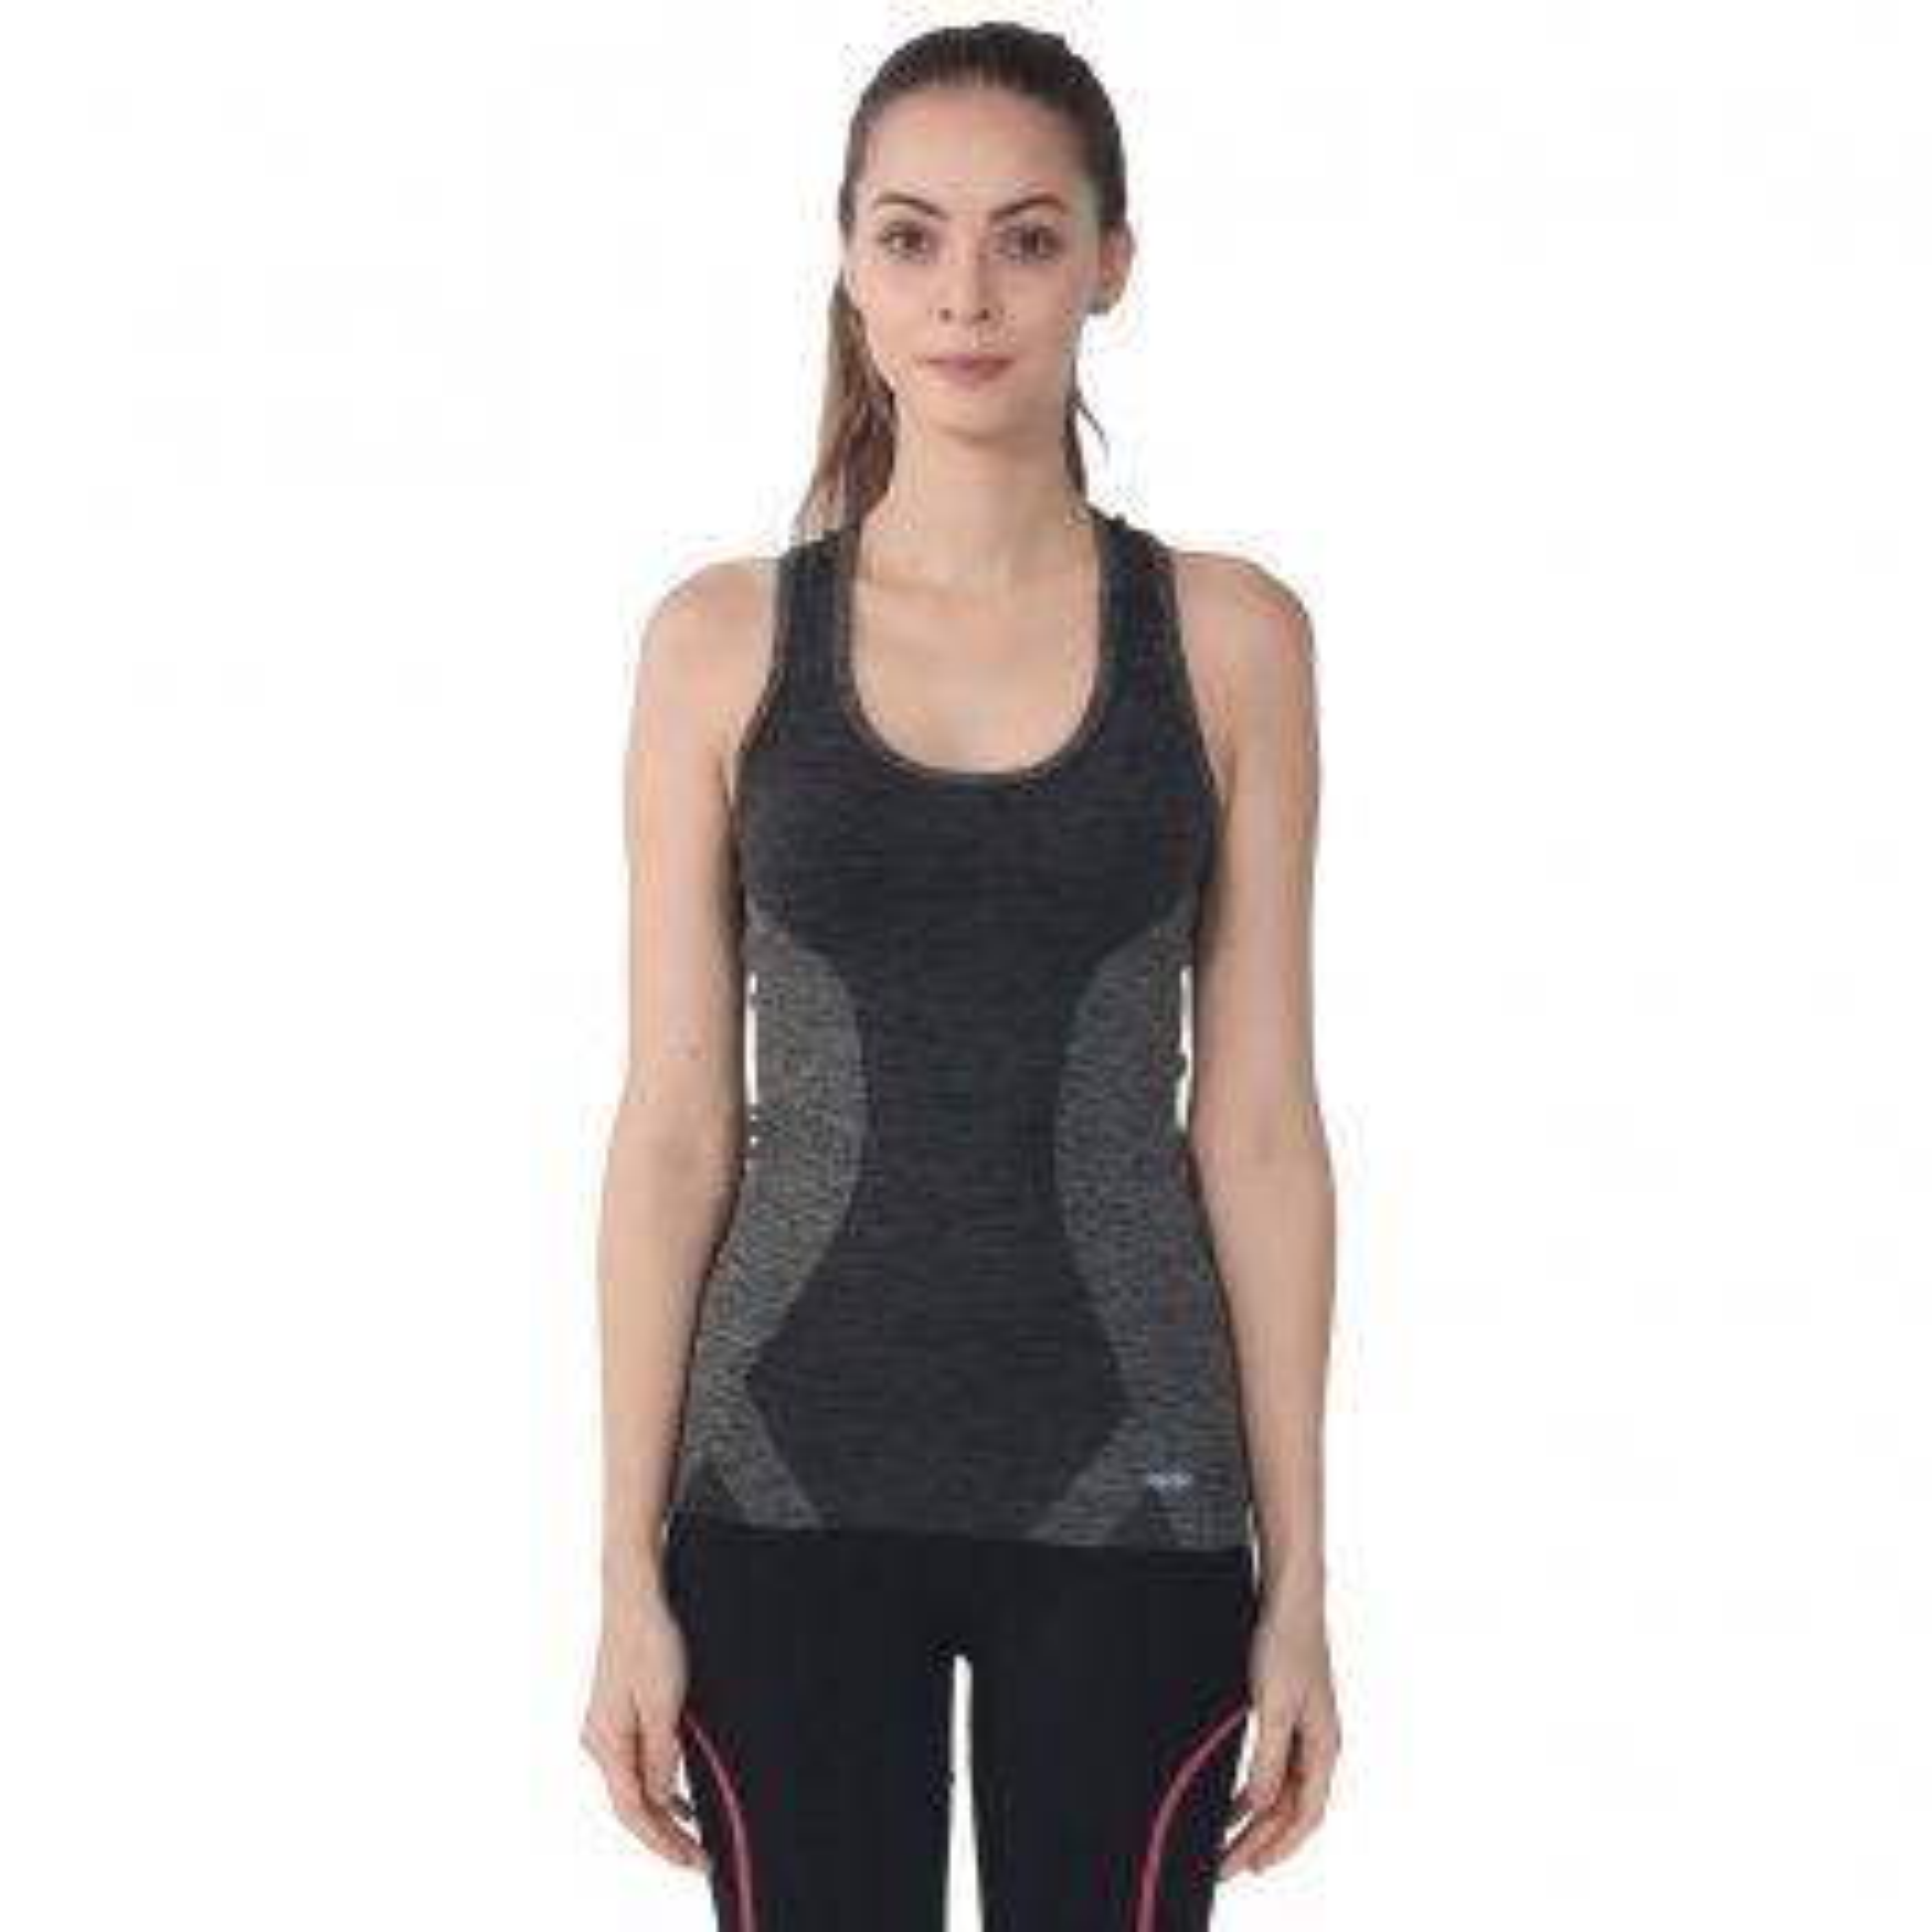 Sportive Seam Kadın Gri Spor Atleti 620050-0BM